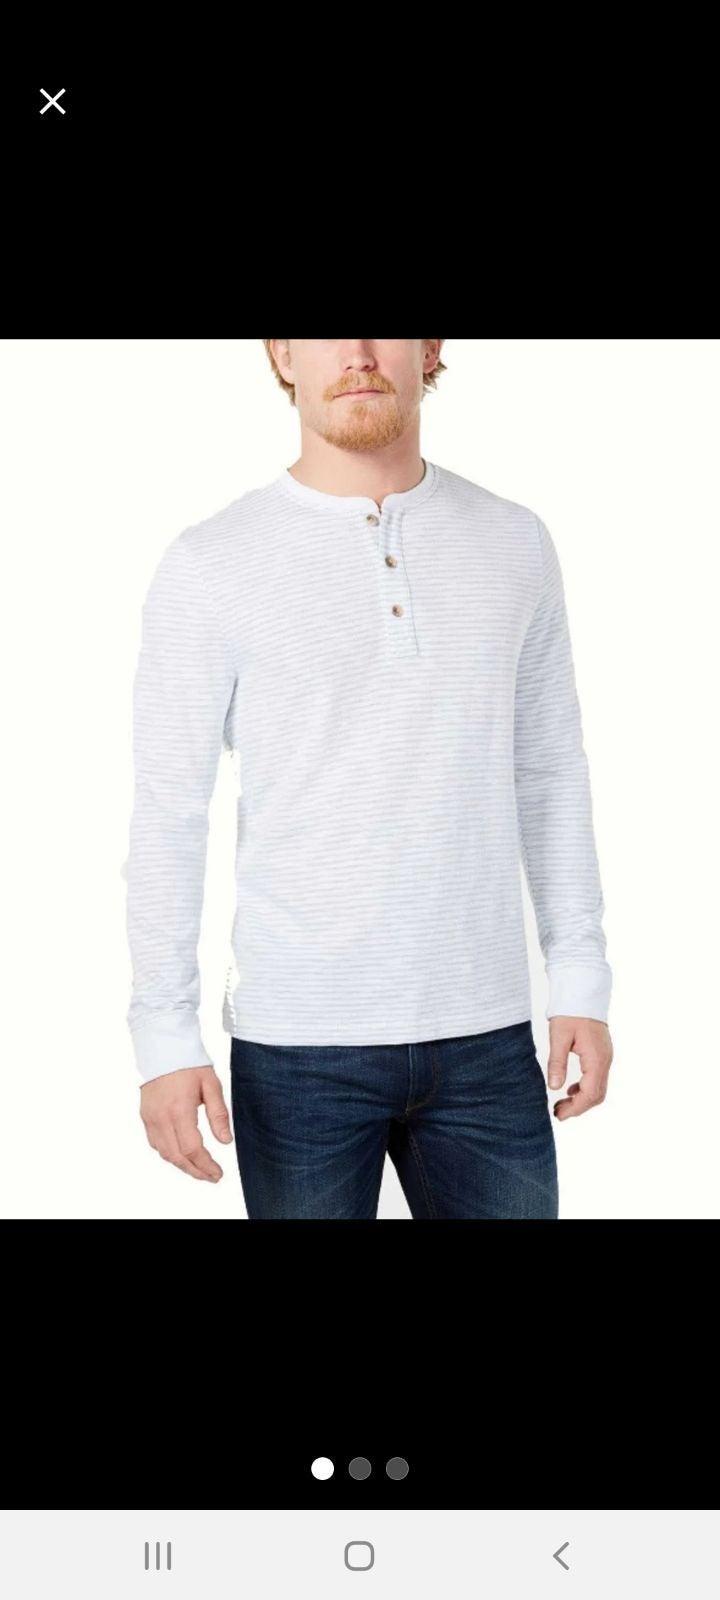 Club Room long-sleeve Henley shirt